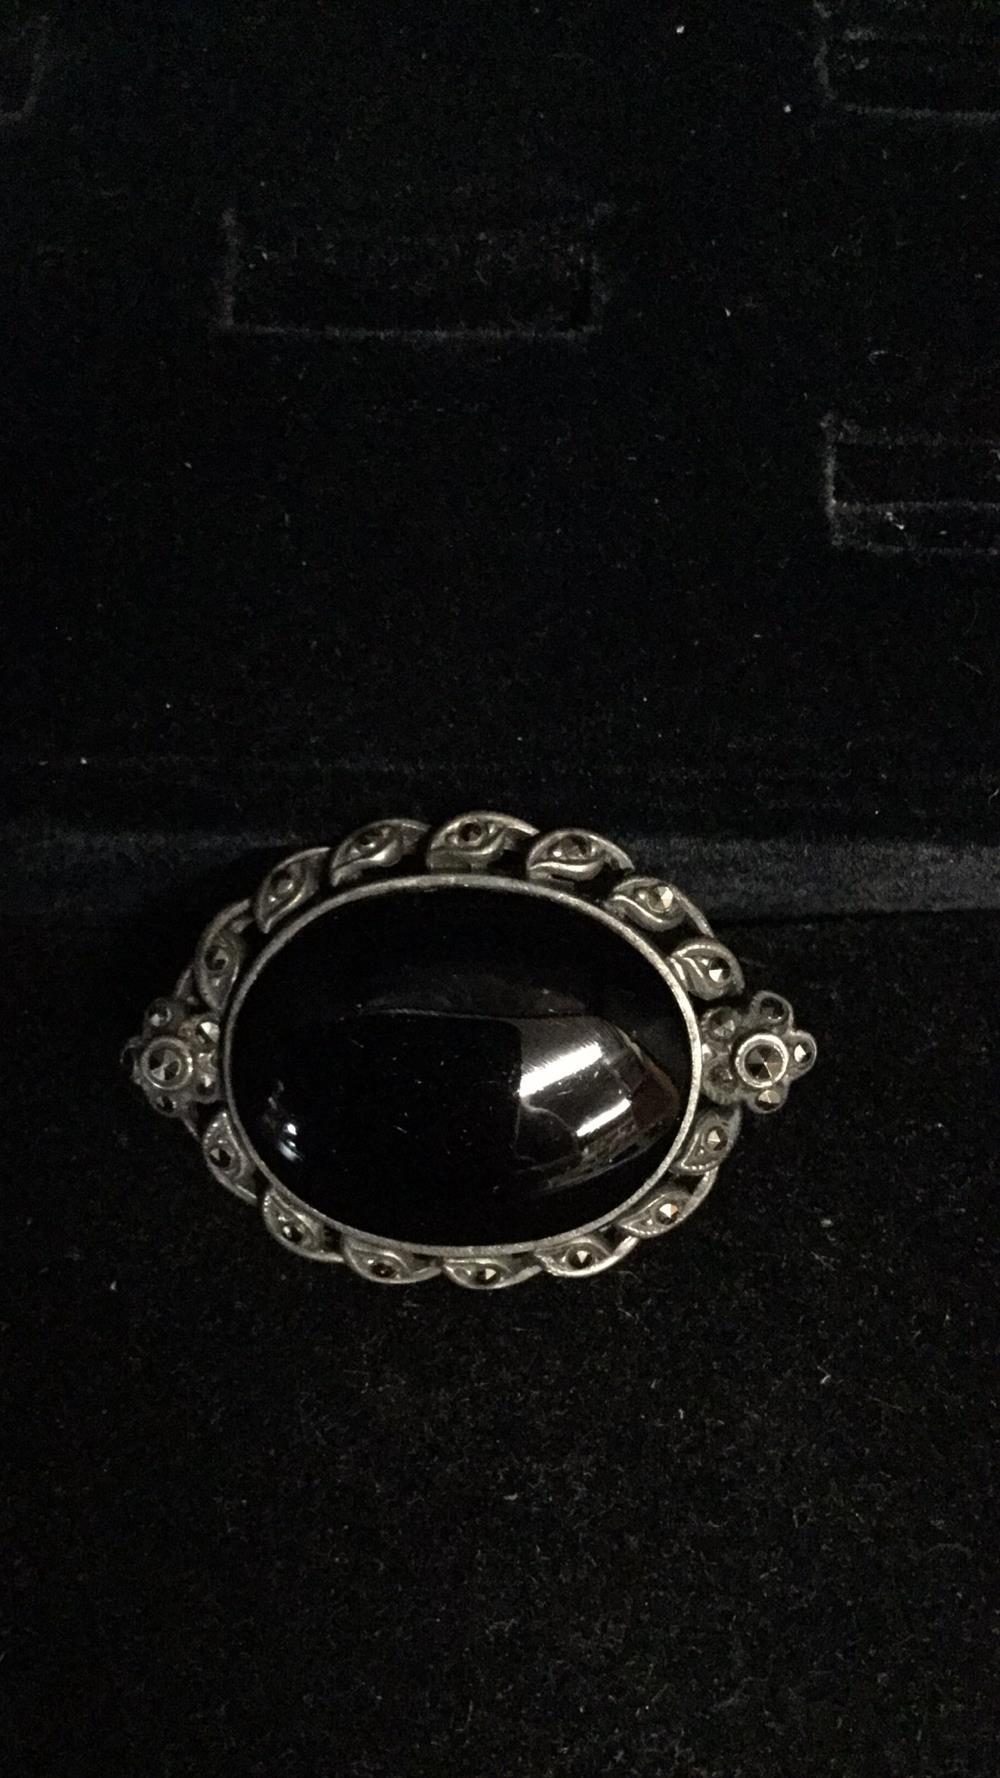 Black onyx silver marcasite brooch